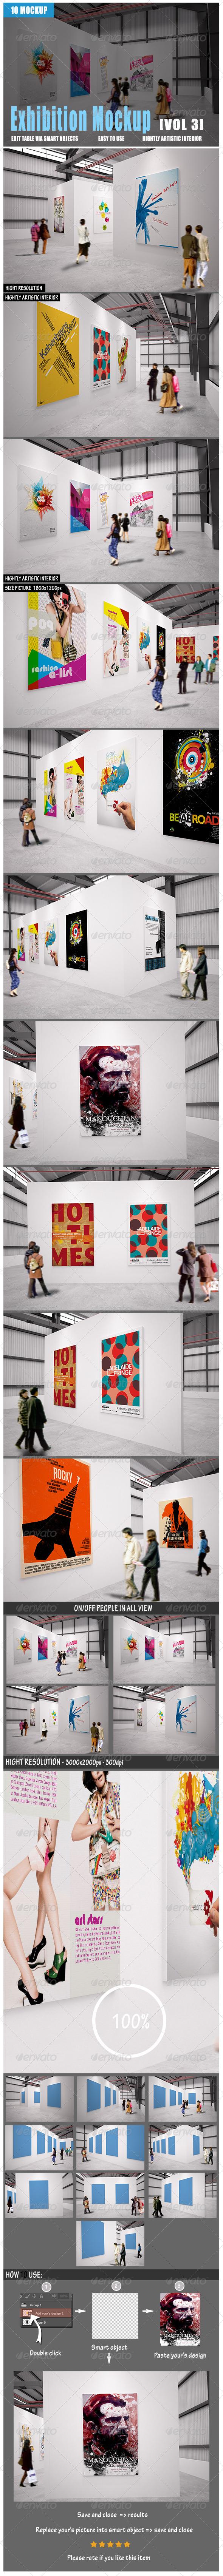 GraphicRiver Exhibition Mockup [vol3] 8526704